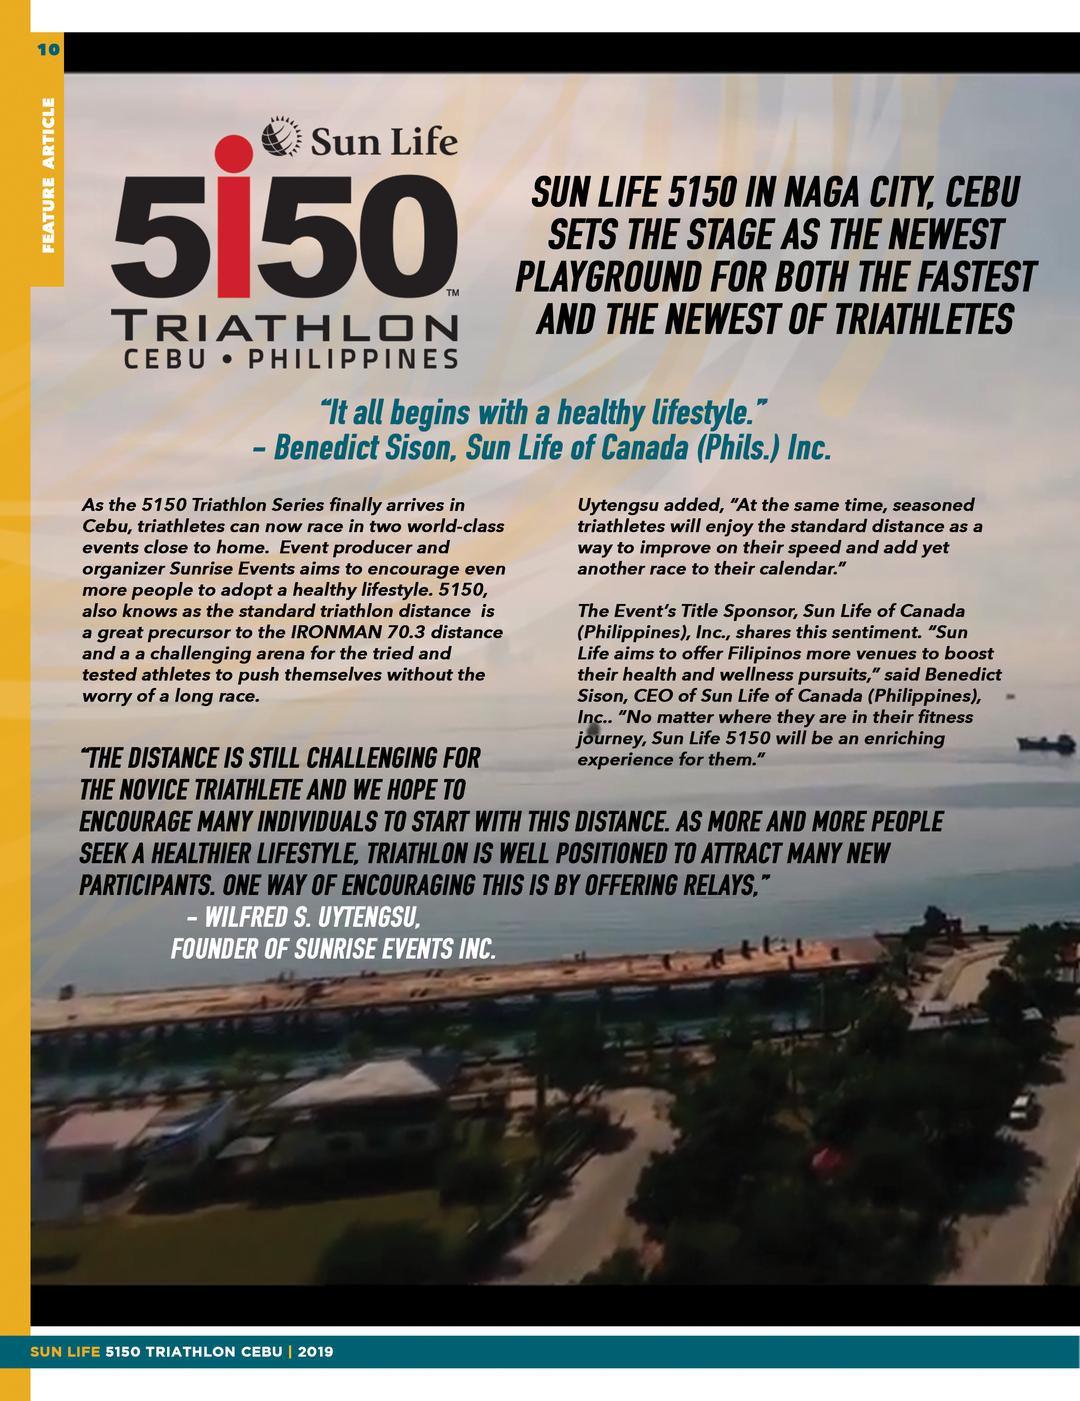 Page 10 of The Inaugural Sun Life 5150 Triathlon in Cebu